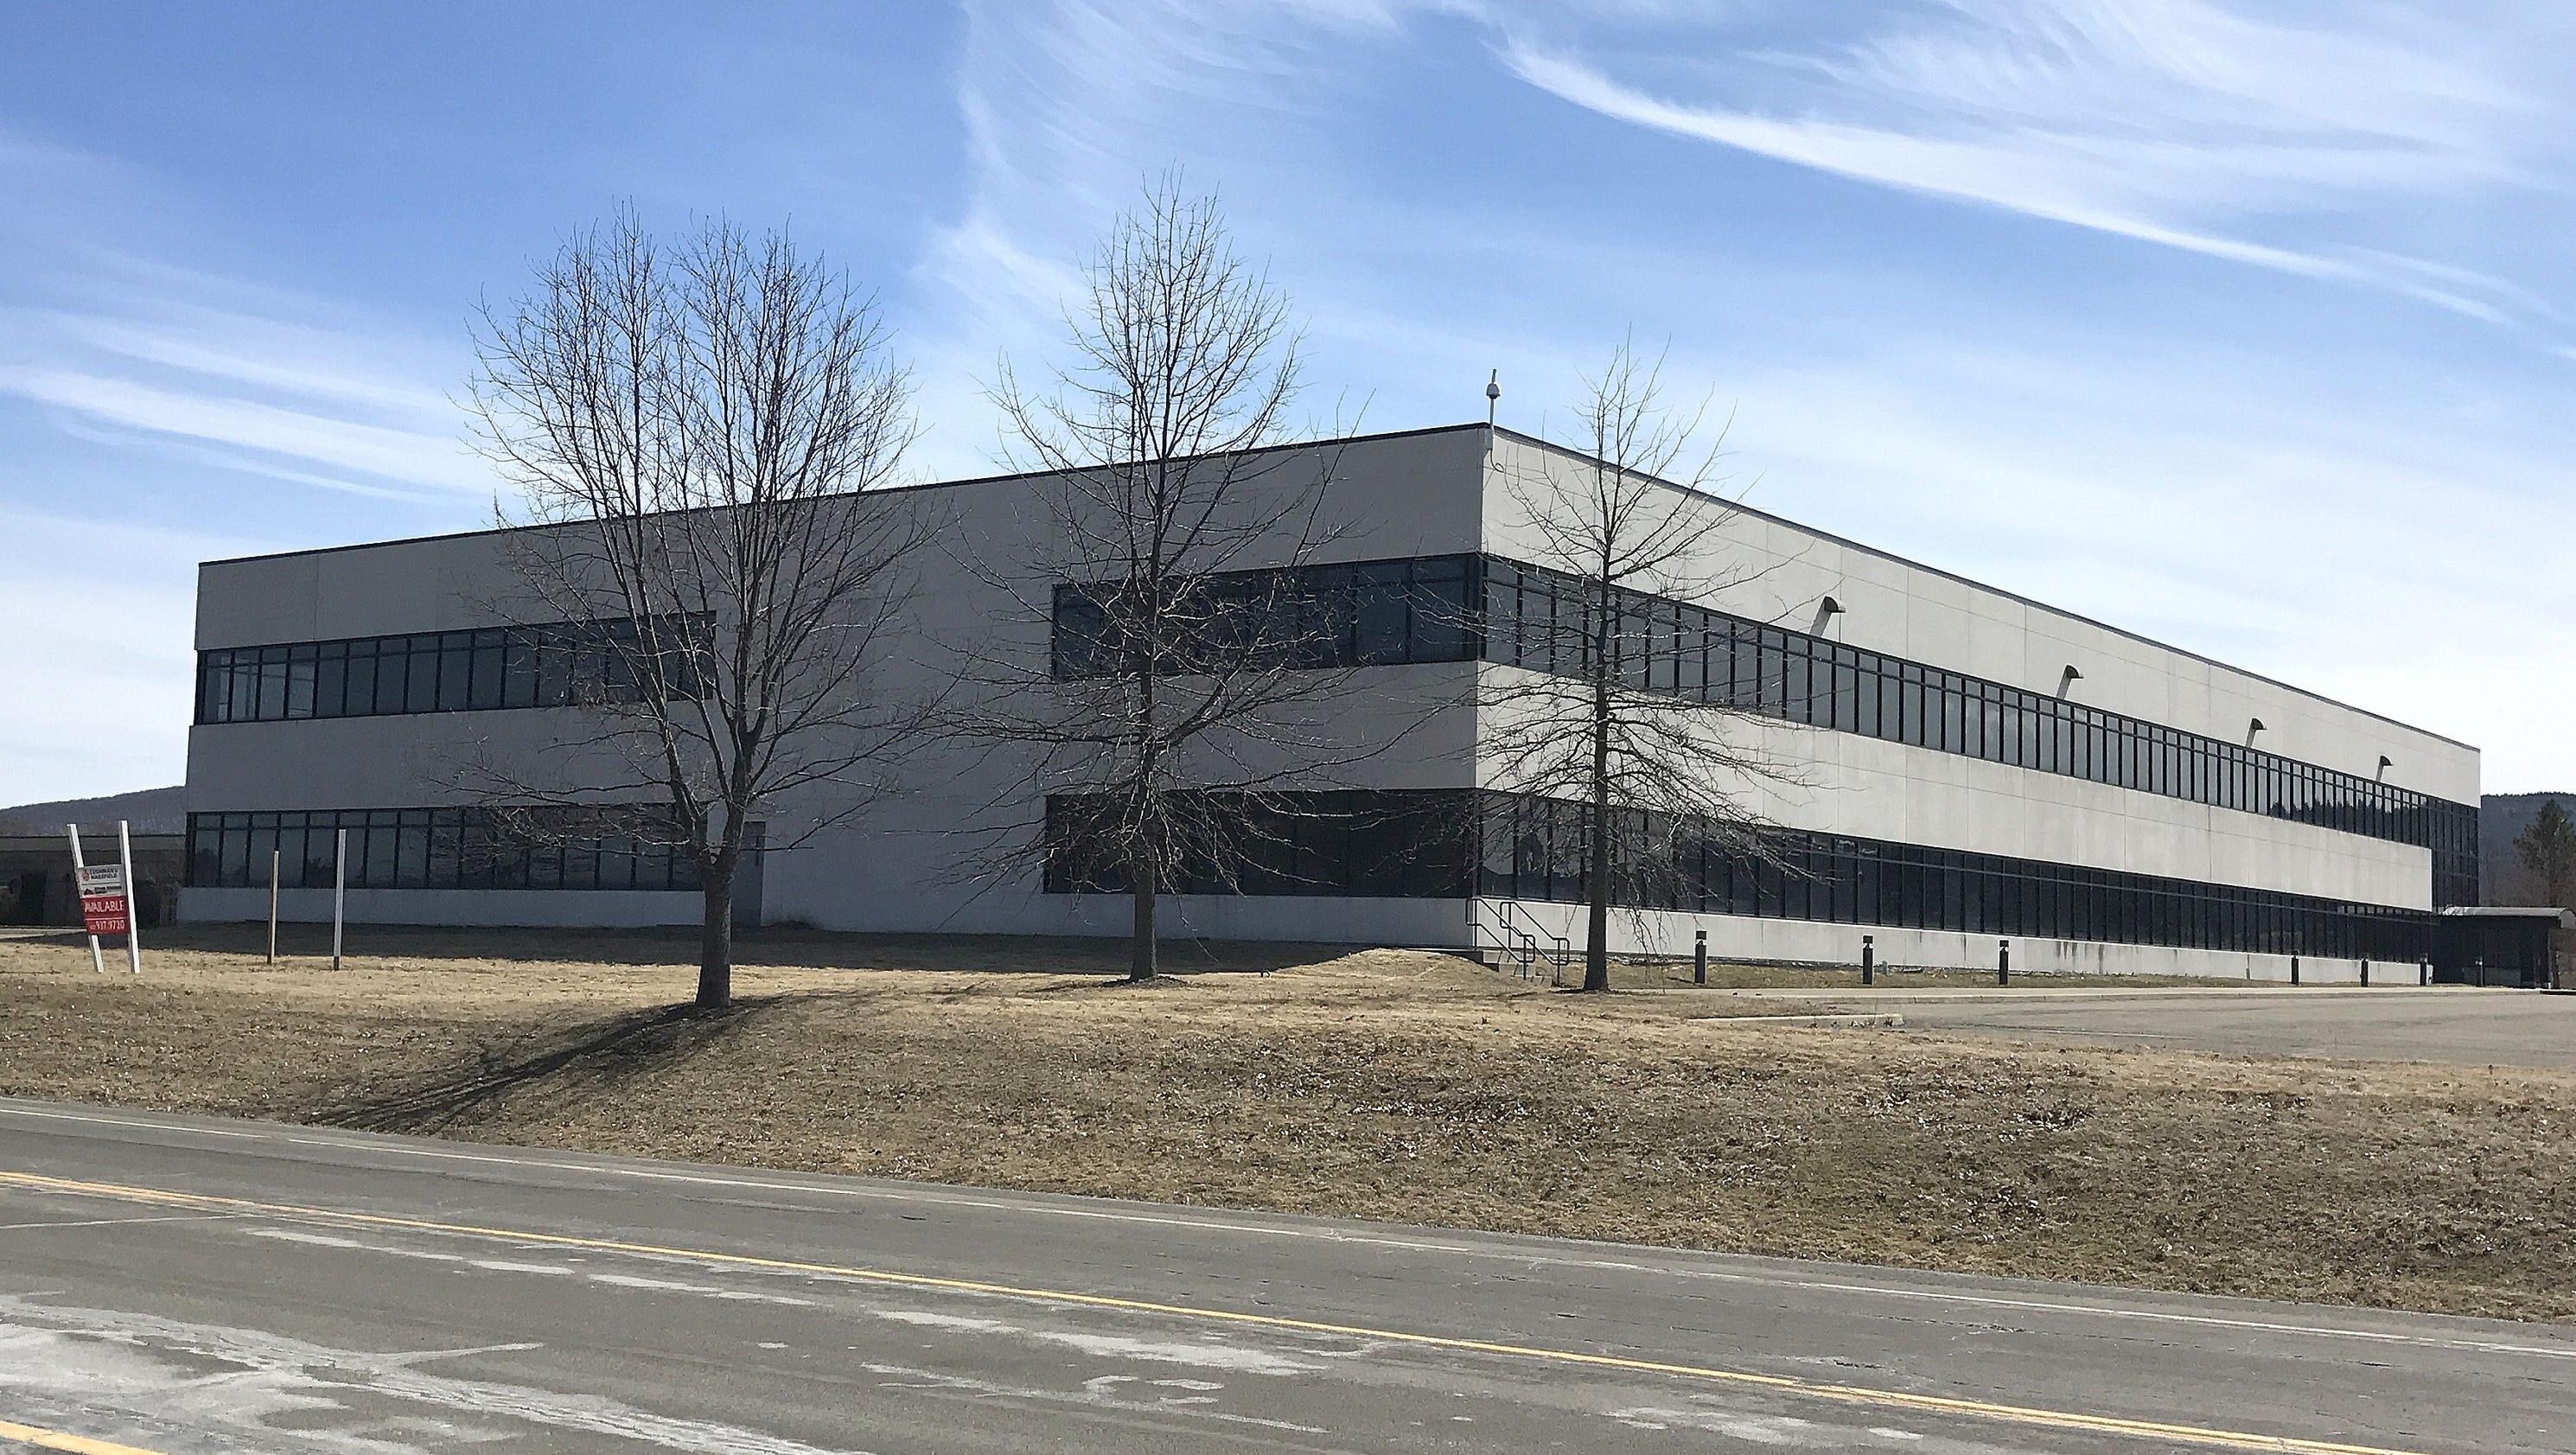 Elmira Area To Get 450 New Jobs With New Wayfair Call Center